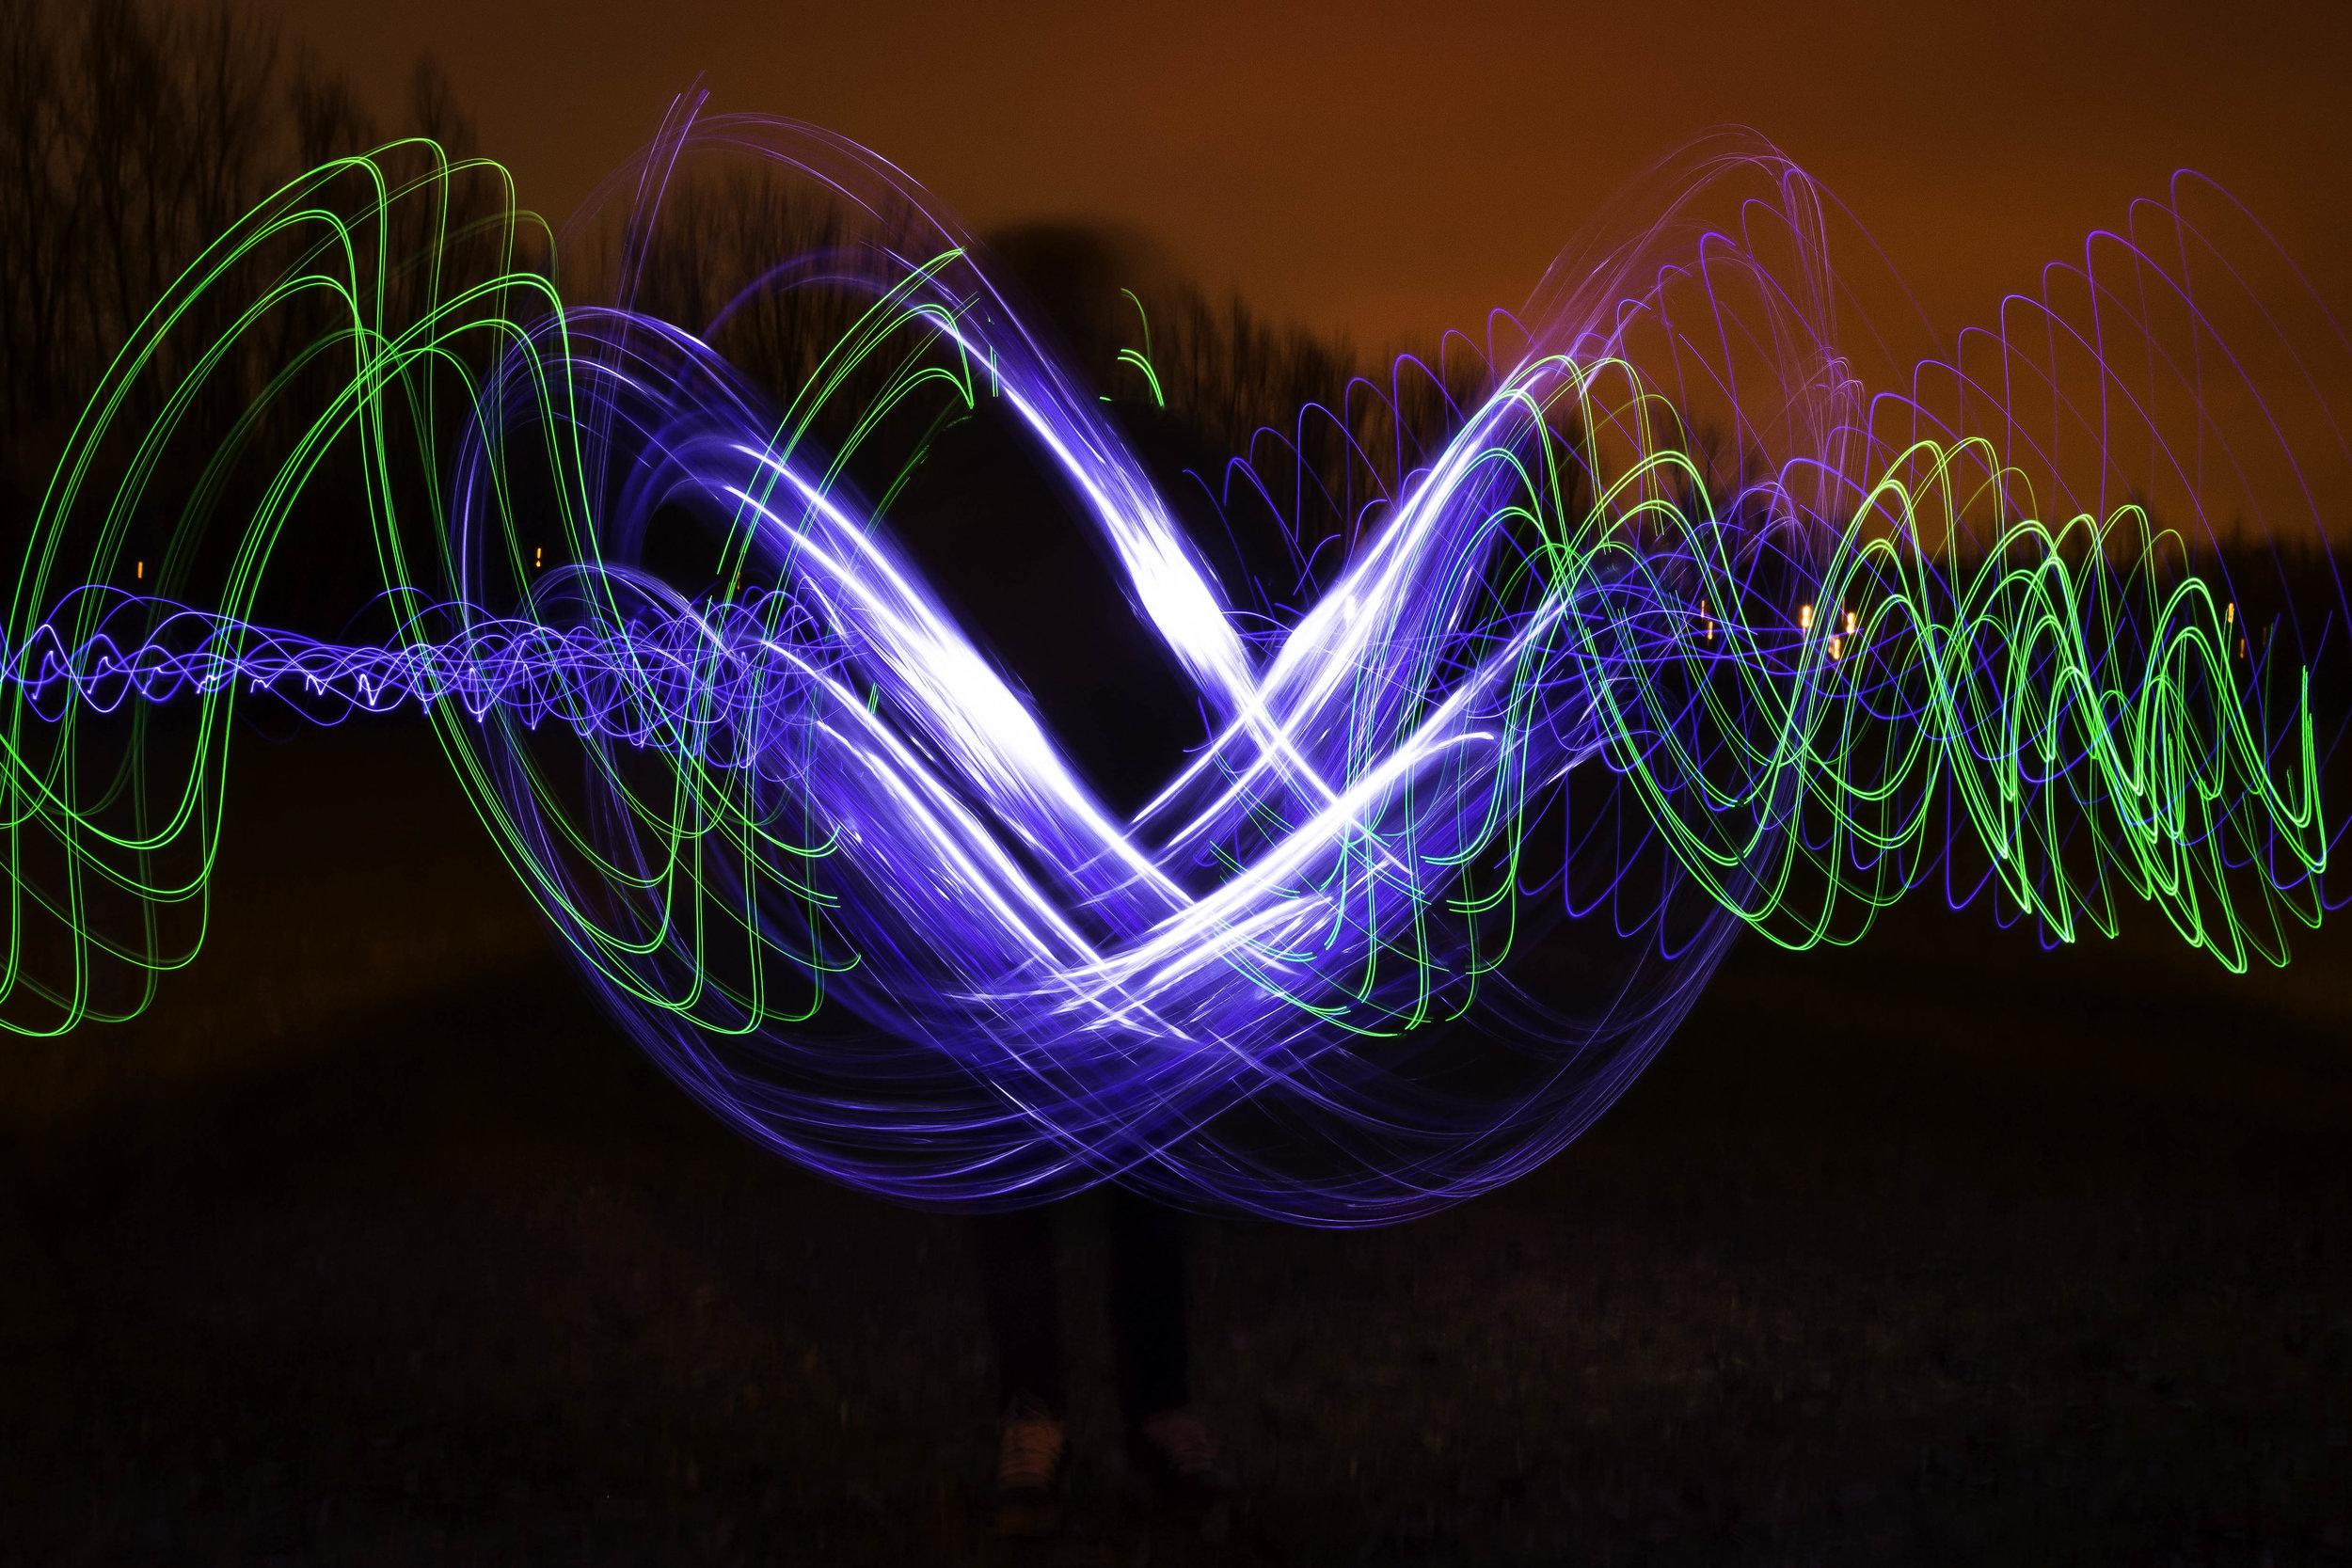 viewfinder-creativeboody-sven-van-santvliet-origineel-verjaardagscadeau-tieners-fotoshoot-lightpainting-3